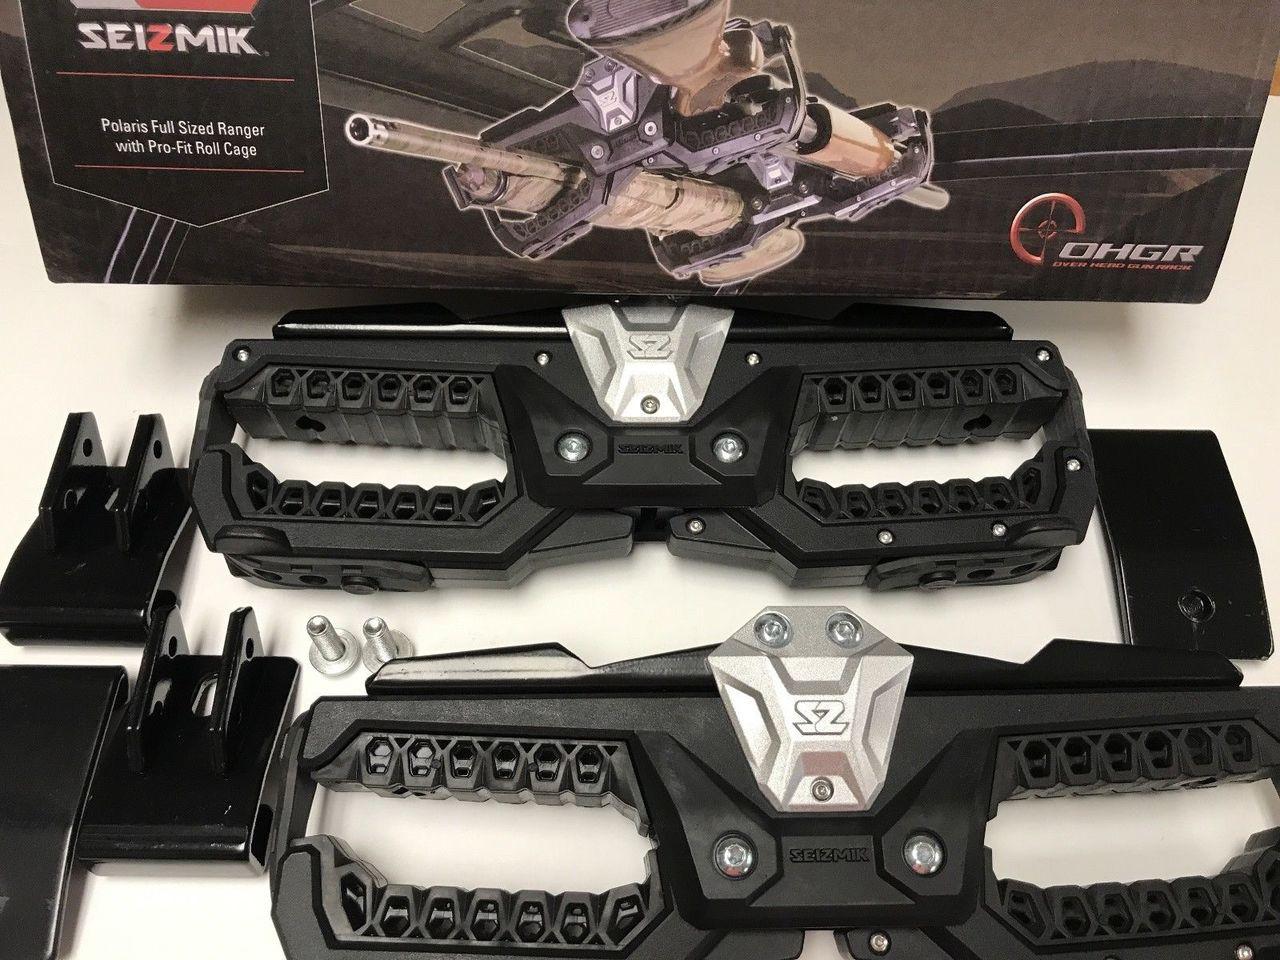 Seizmik Overhead Gun Rack 2 00 Cage Clamp Honda Pioneer 1000 16-18